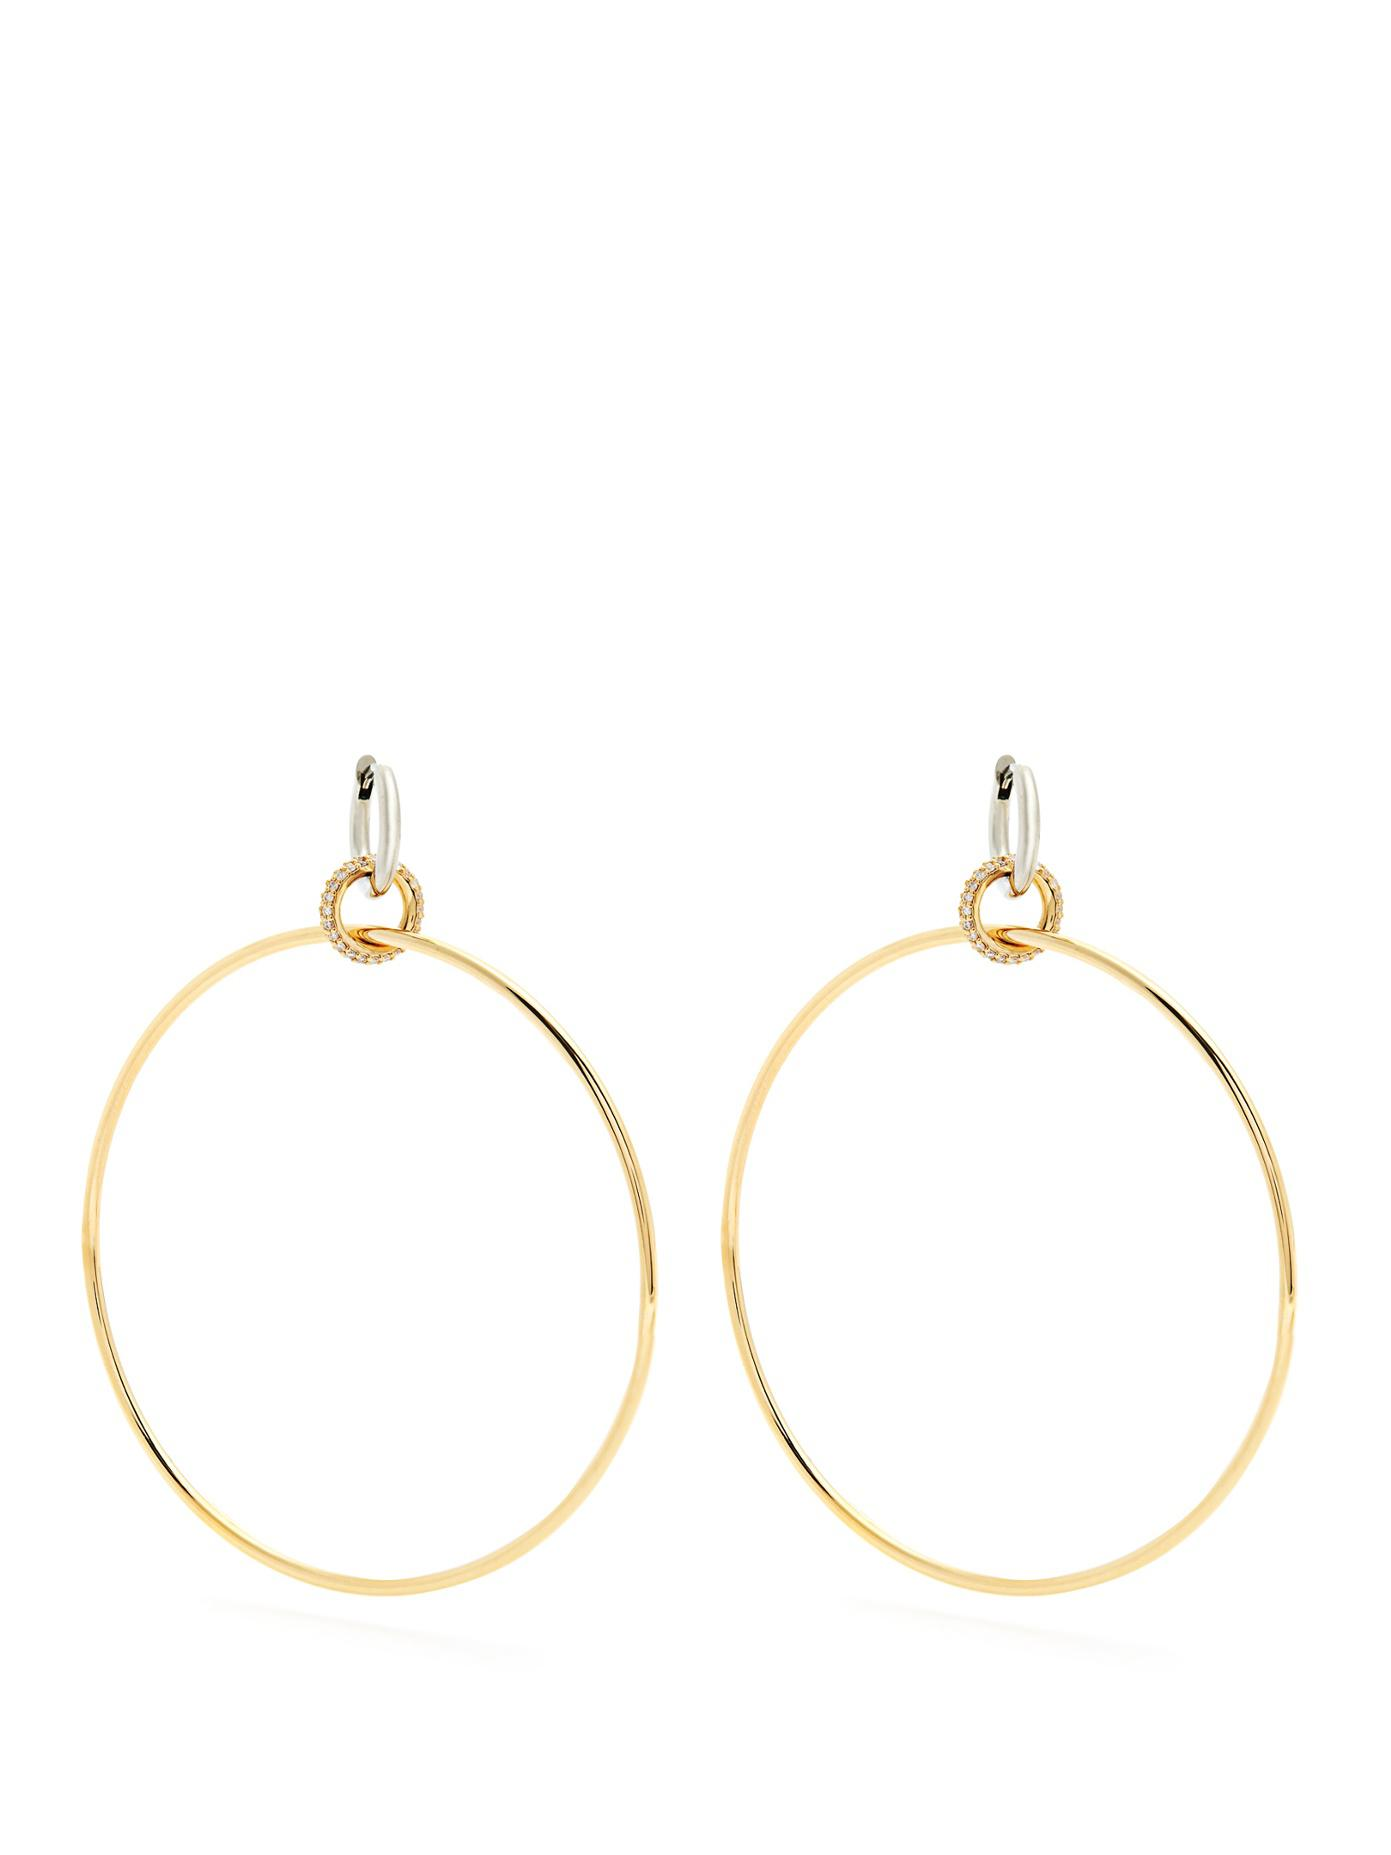 Altaire diamond, white & yellow-gold earrings Spinelli Kilcollin